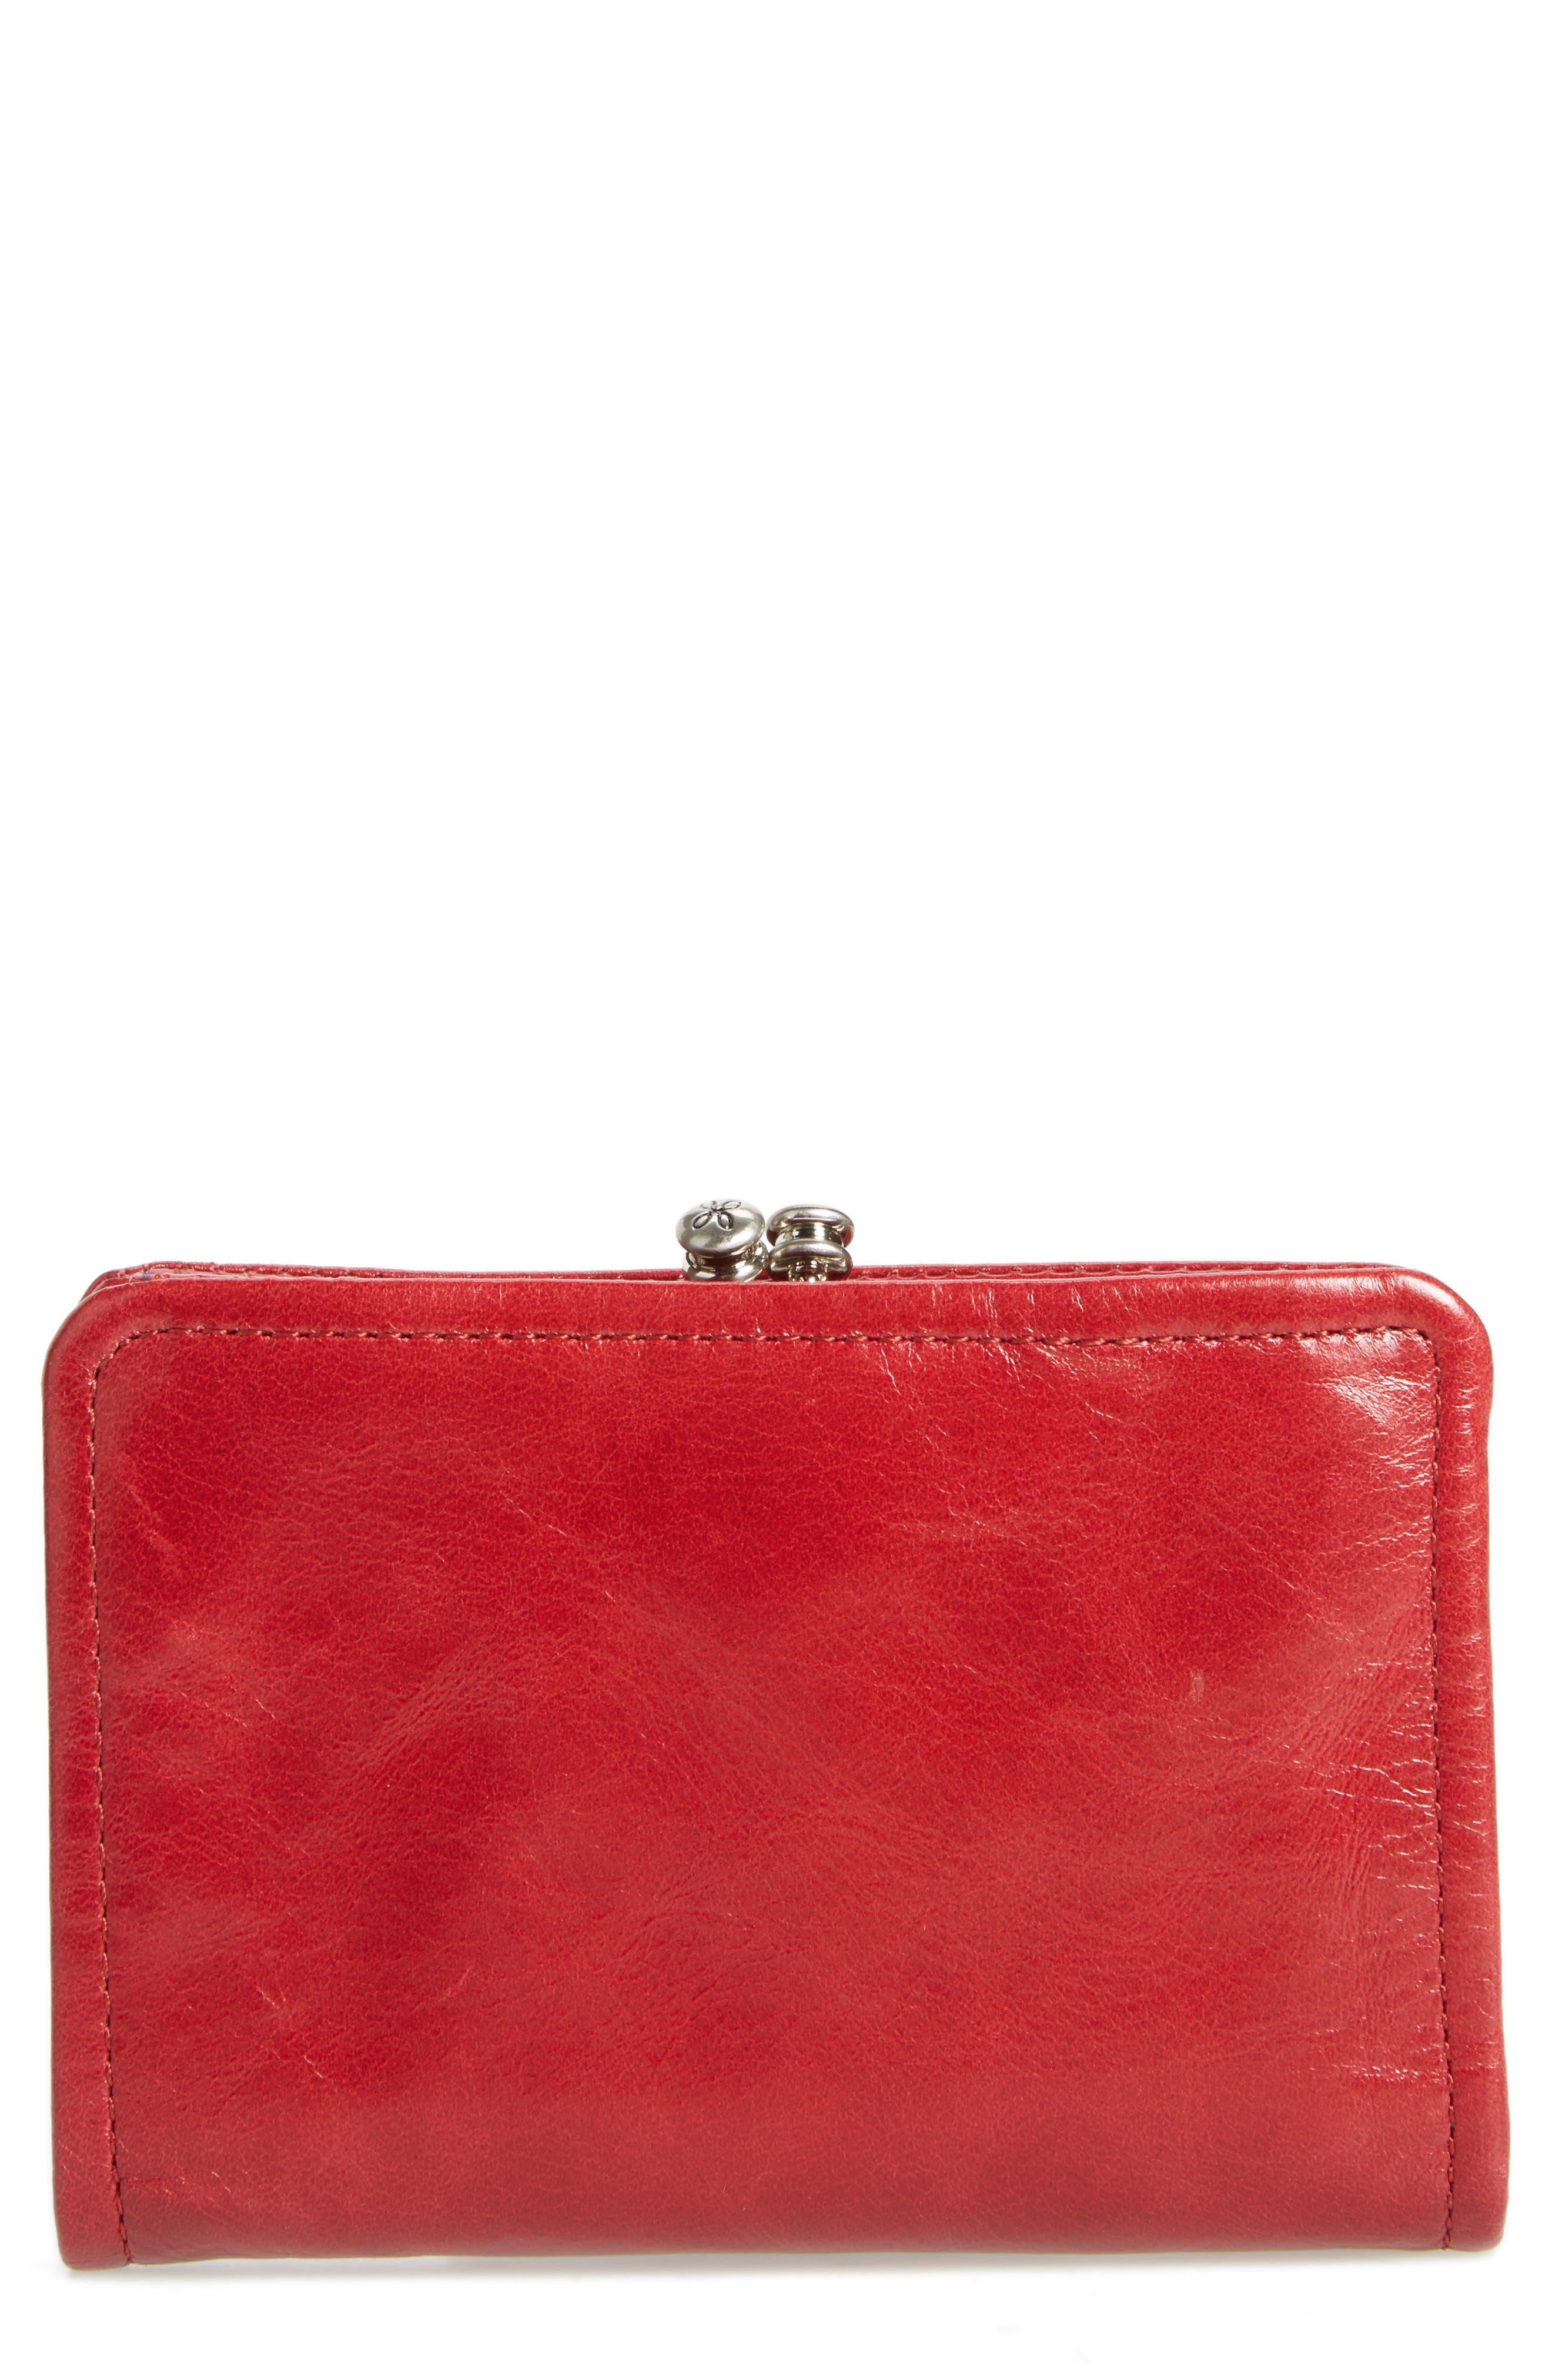 Delta Calfskin Leather Wallet,                             Main thumbnail 1, color,                             Cardinal